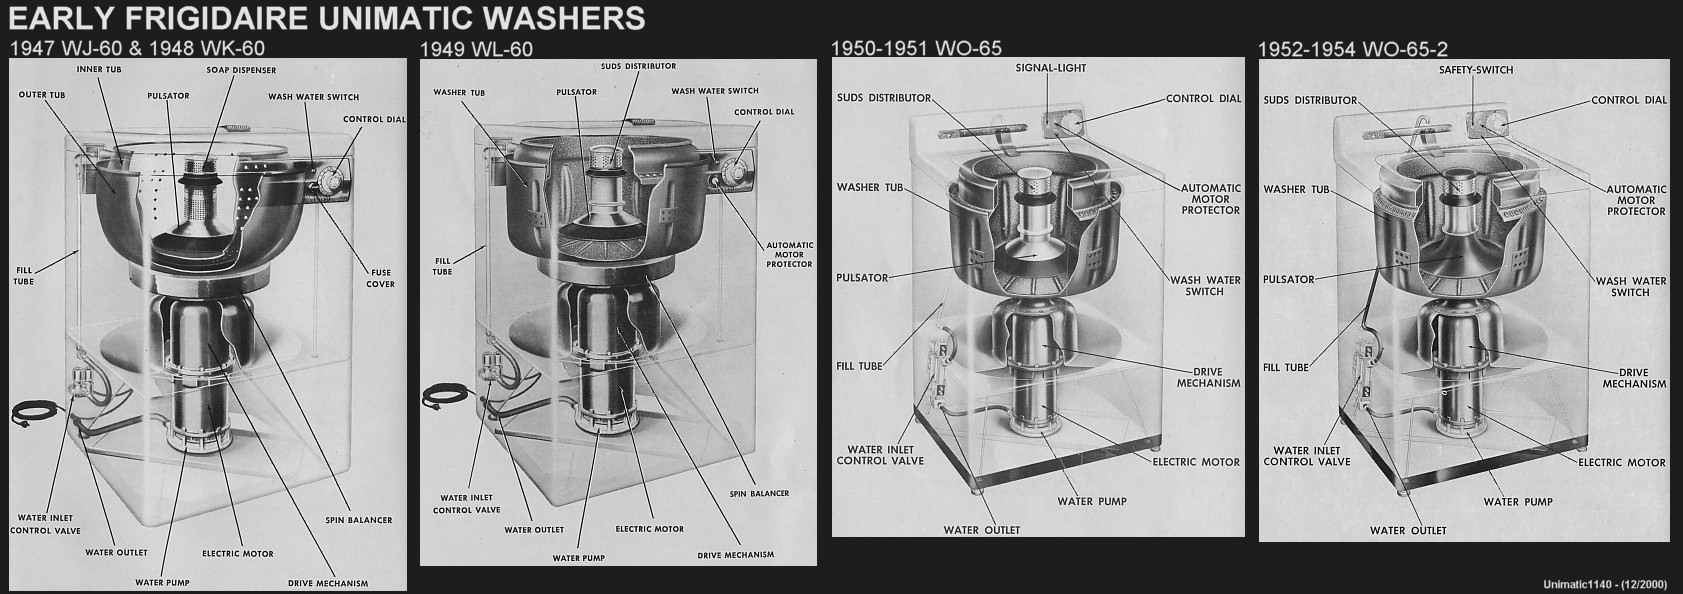 Whirlpool Washer Diagram